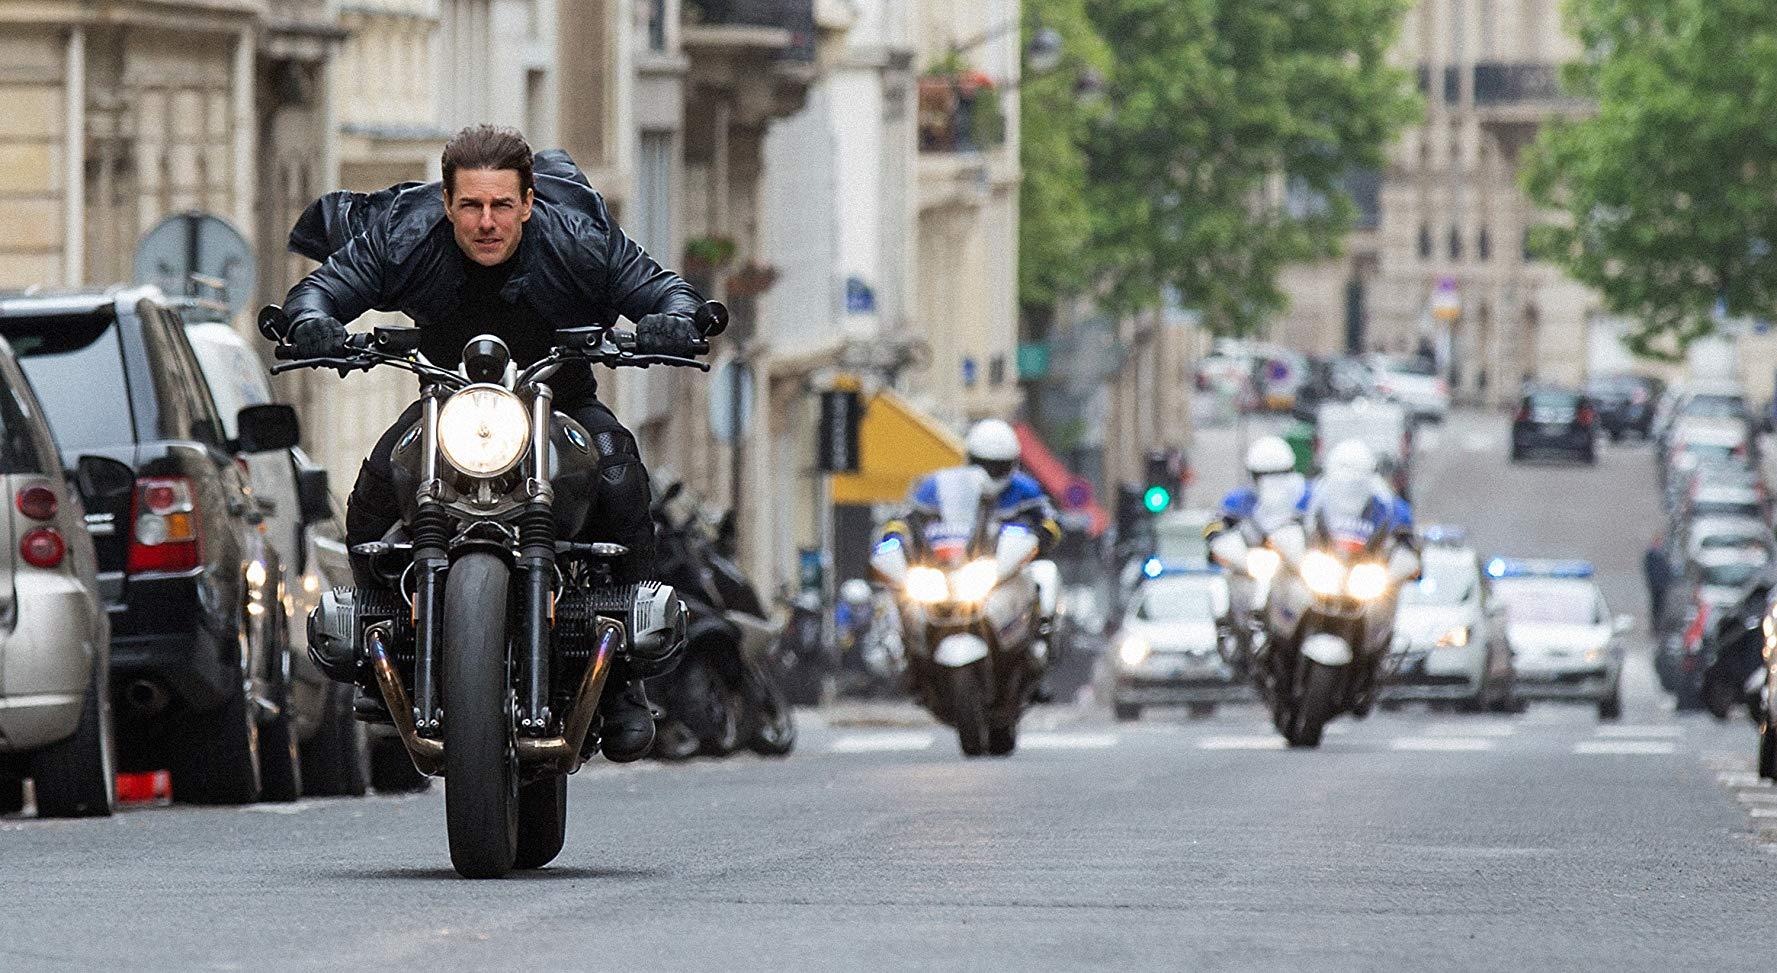 motorcycleChase.jpg